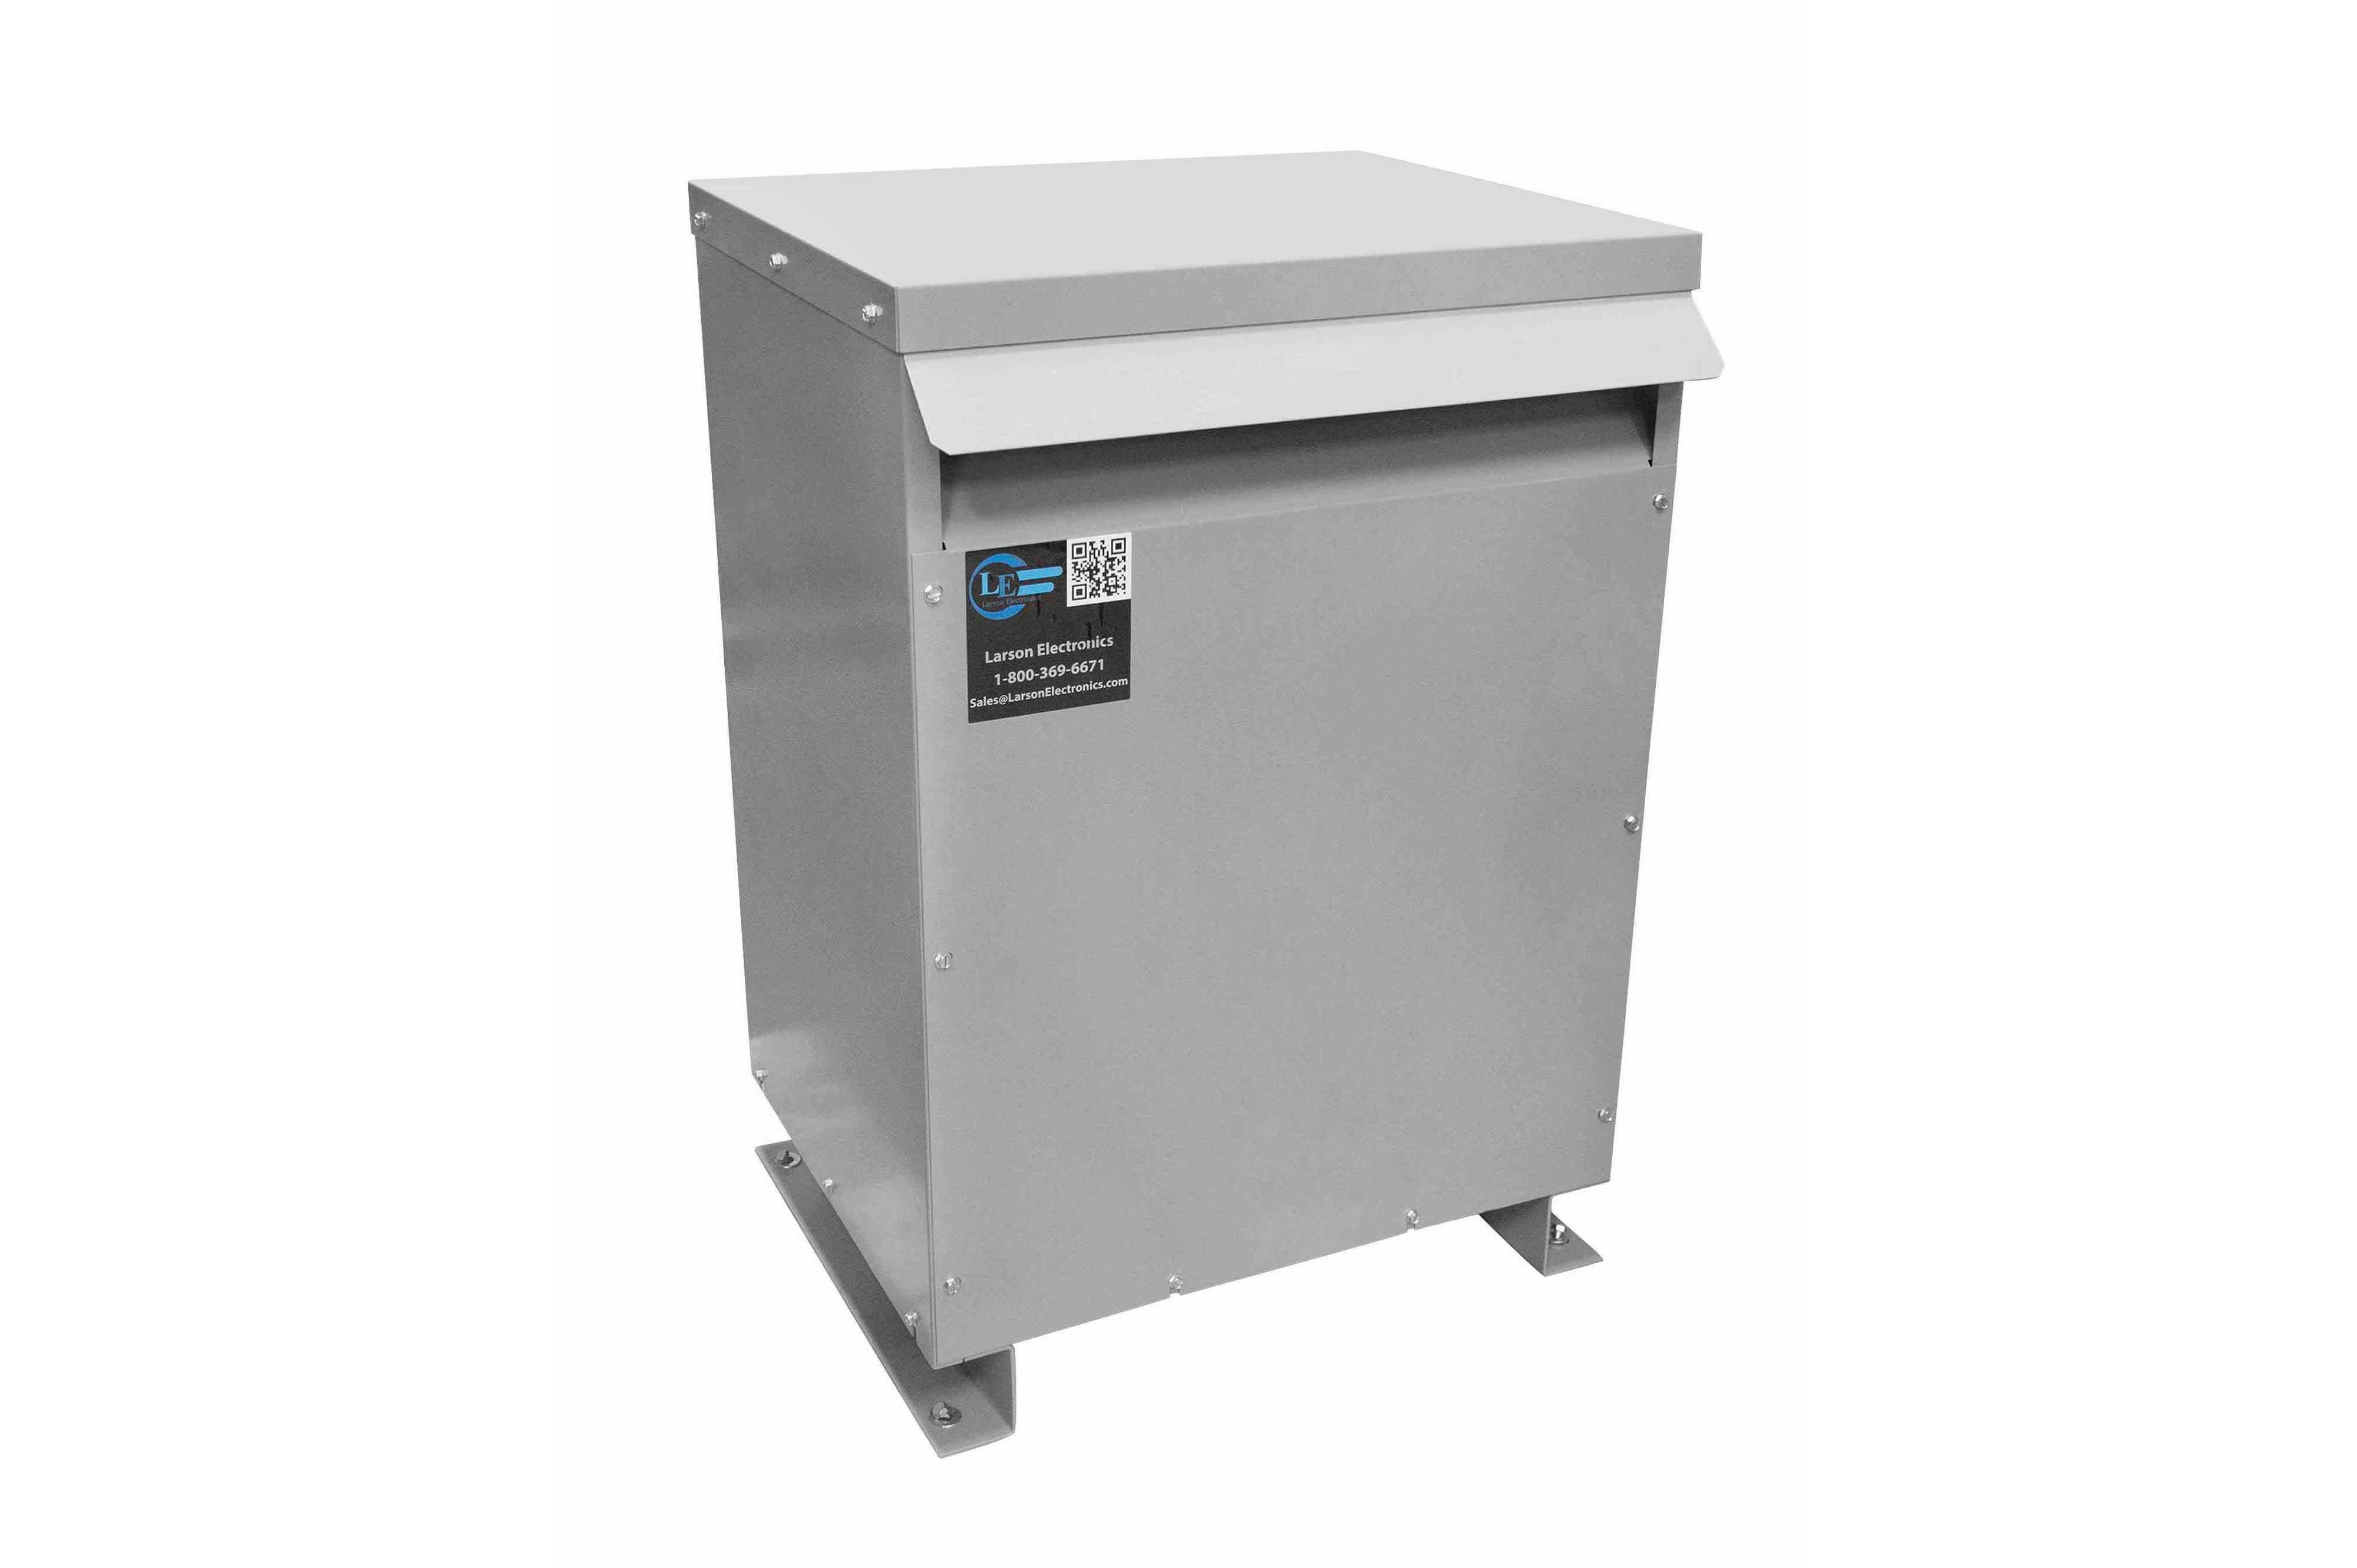 38 kVA 3PH Isolation Transformer, 400V Wye Primary, 600V Delta Secondary, N3R, Ventilated, 60 Hz